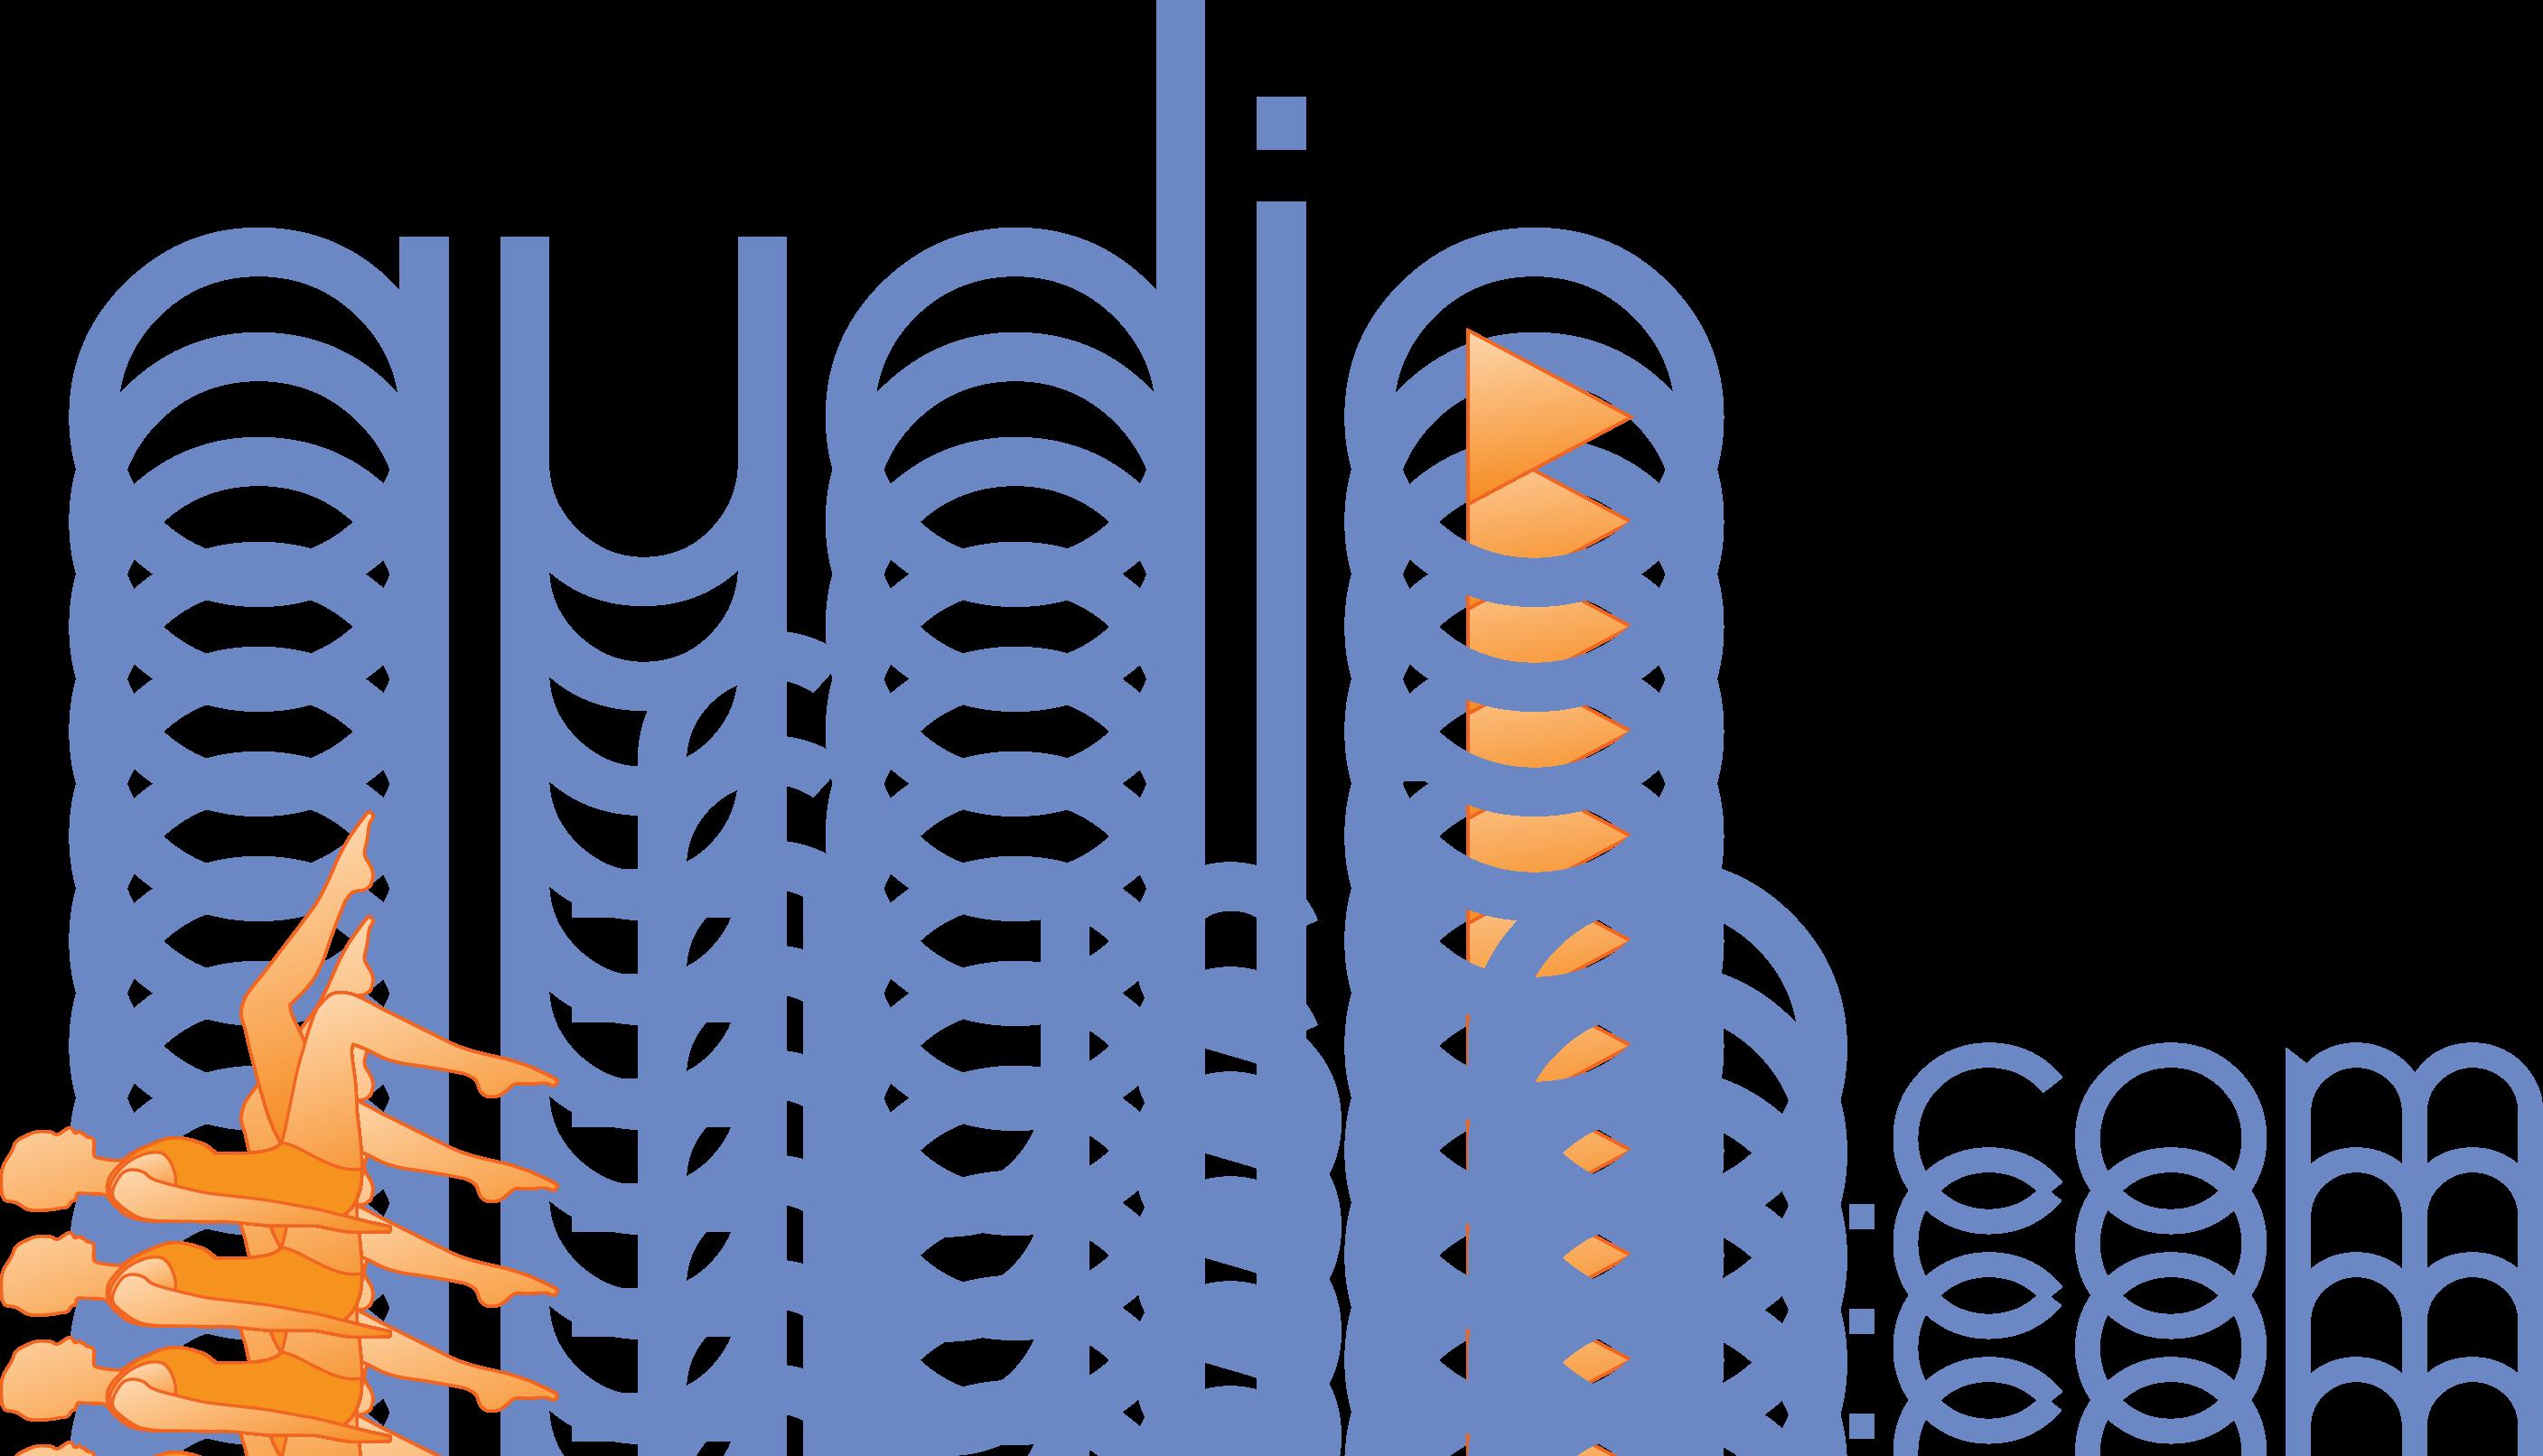 audio a hipertónia meditációjához